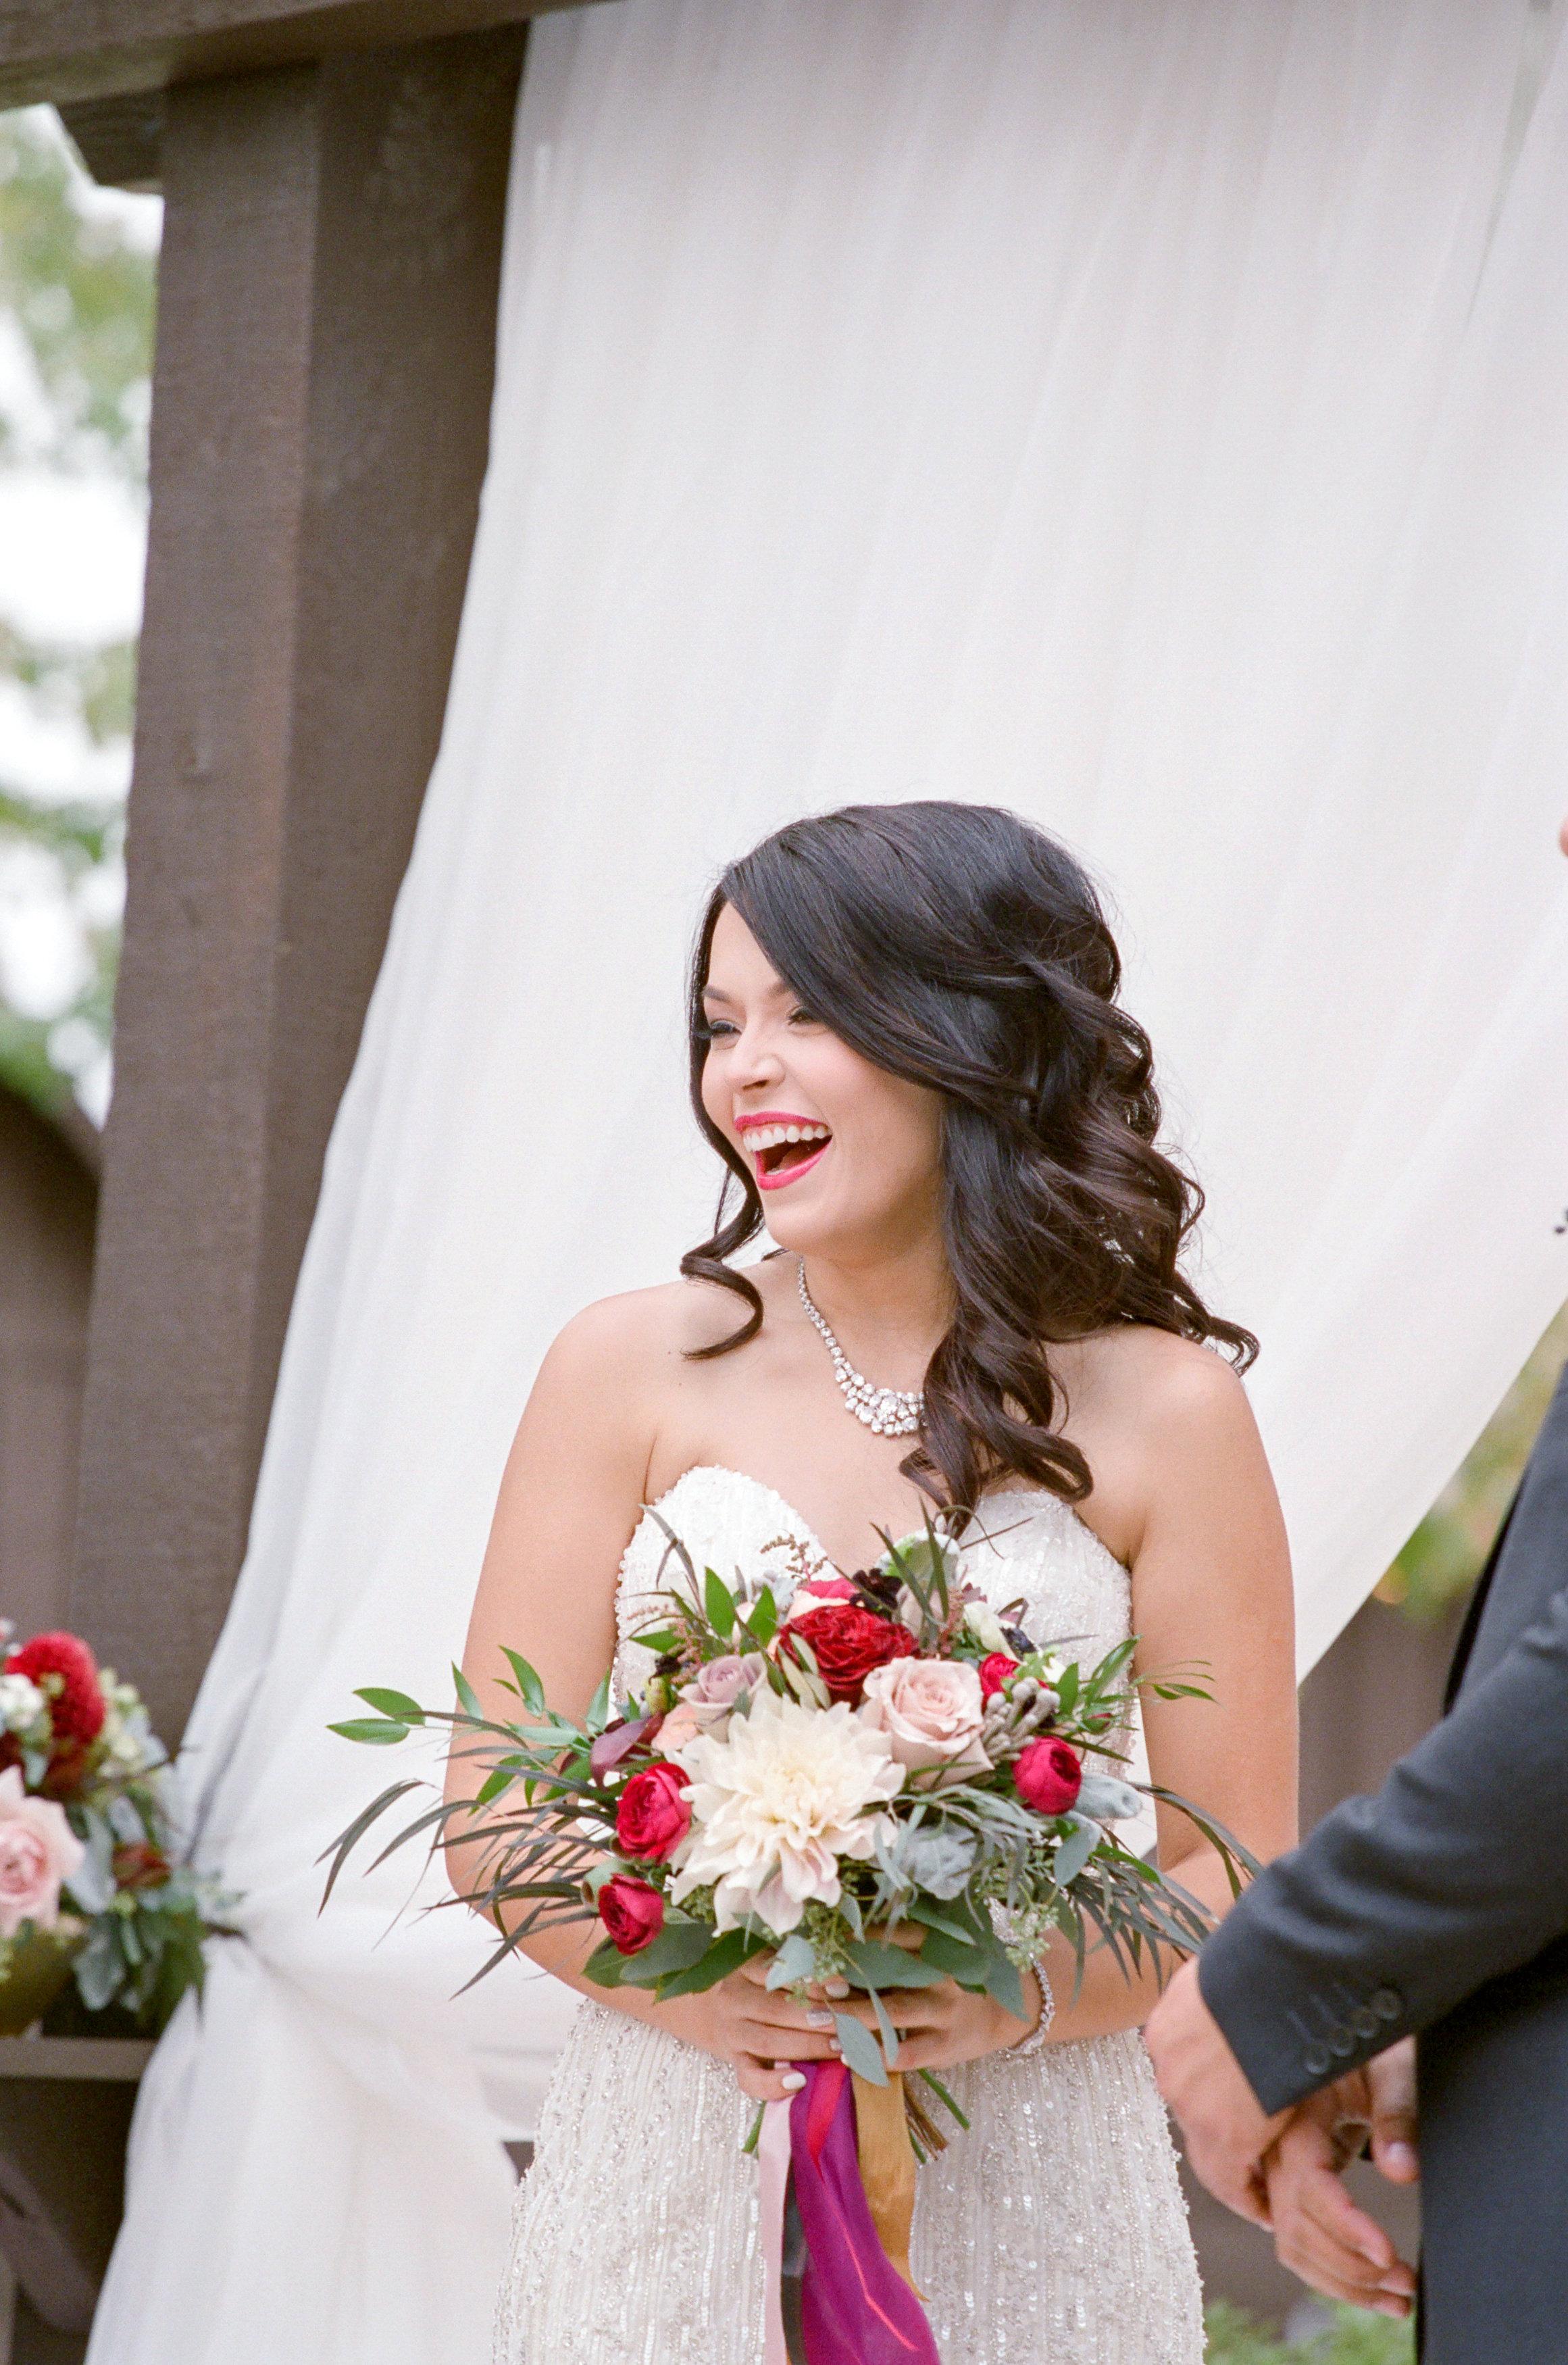 Amador_County_Wedding_Bride_Bouquet_Color_Scheme_Draping_Rancho_Victoria_Vineyard_Northern_California.jpg